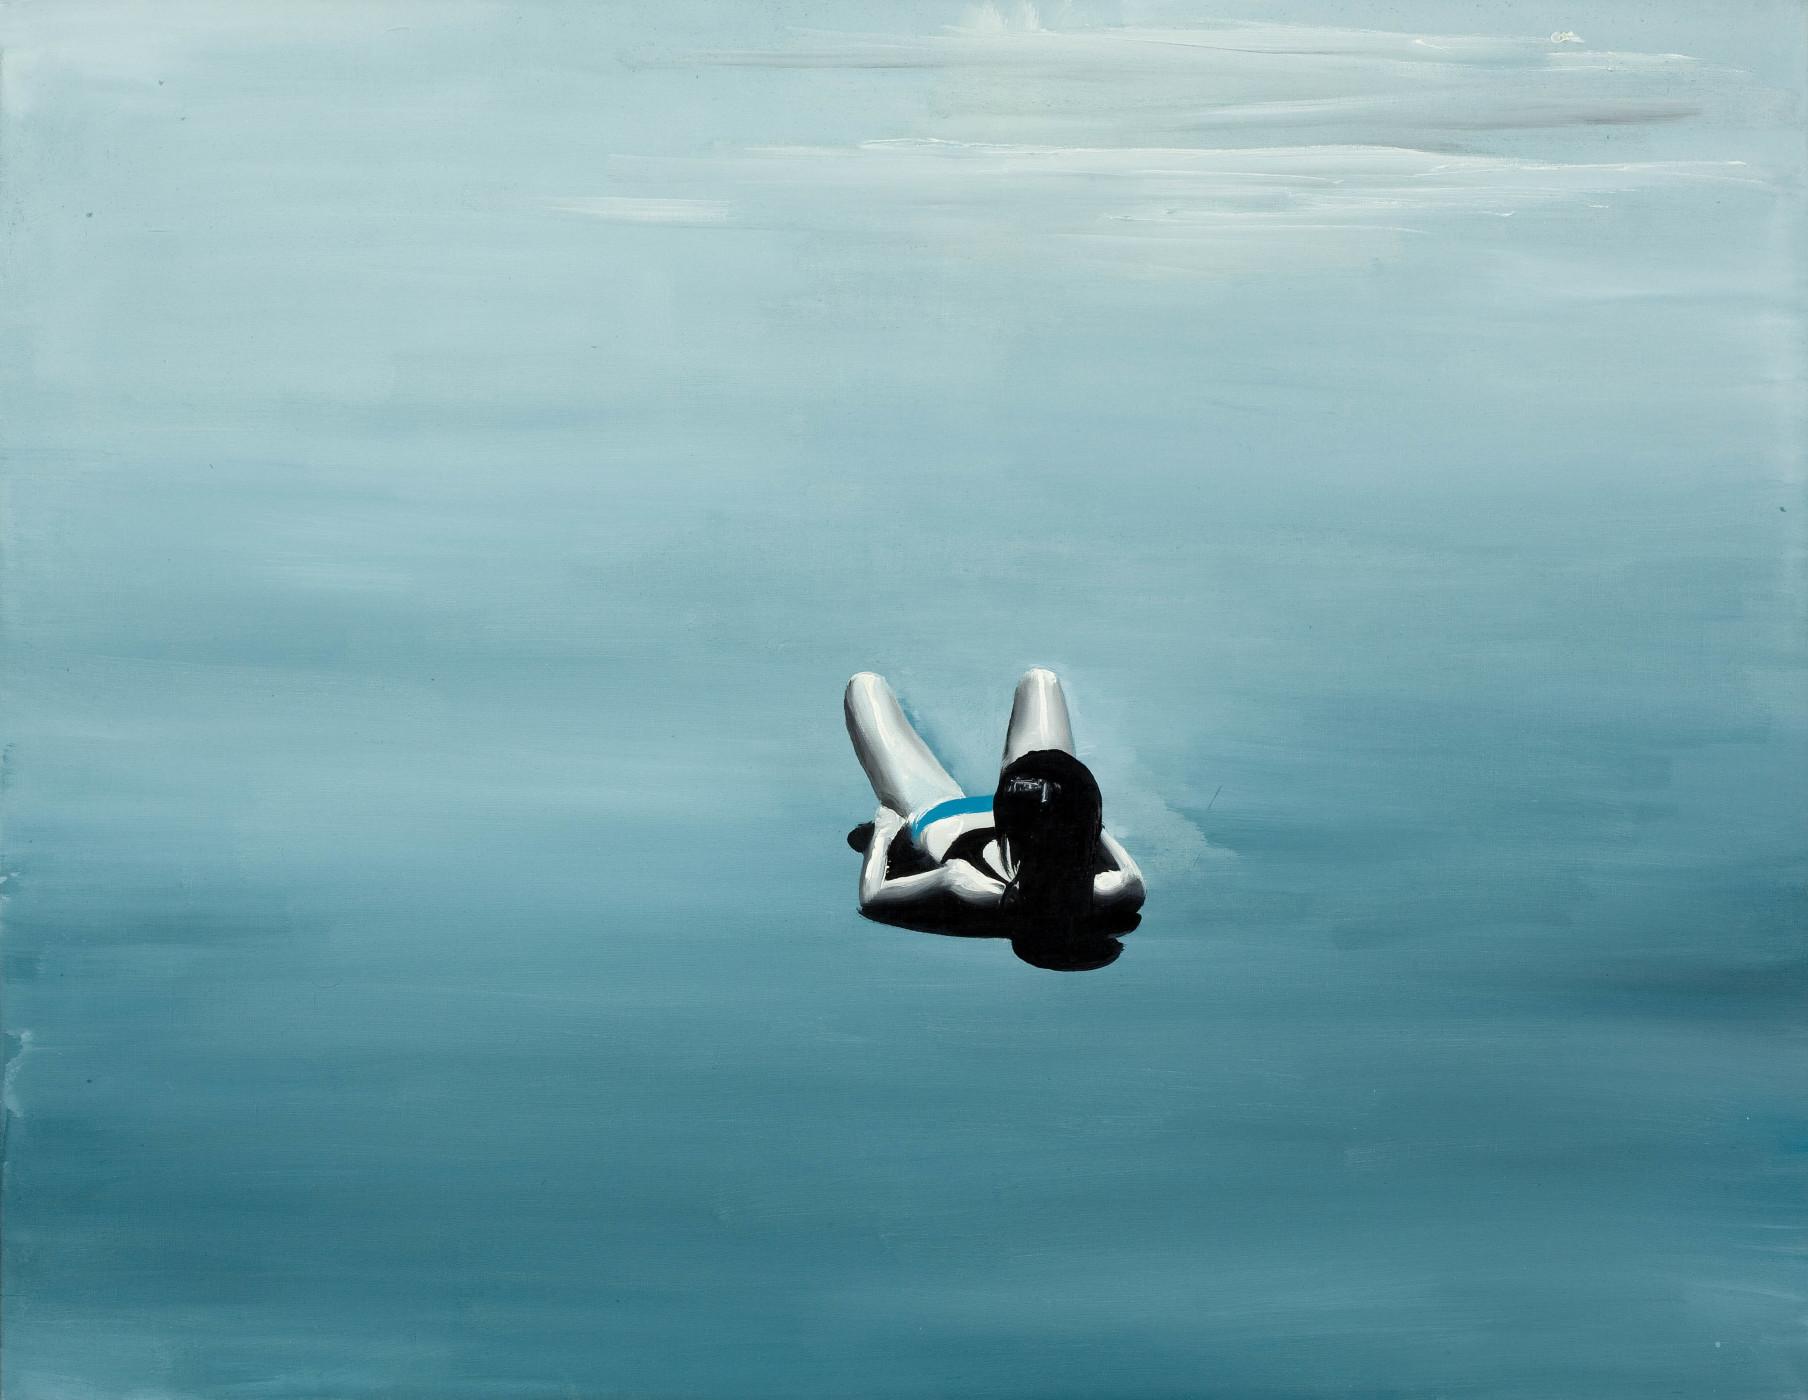 <p><em>Untitled (Anka)</em>, 2010</p><p>oil on canvas</p><p>55 x 70 cm</p>